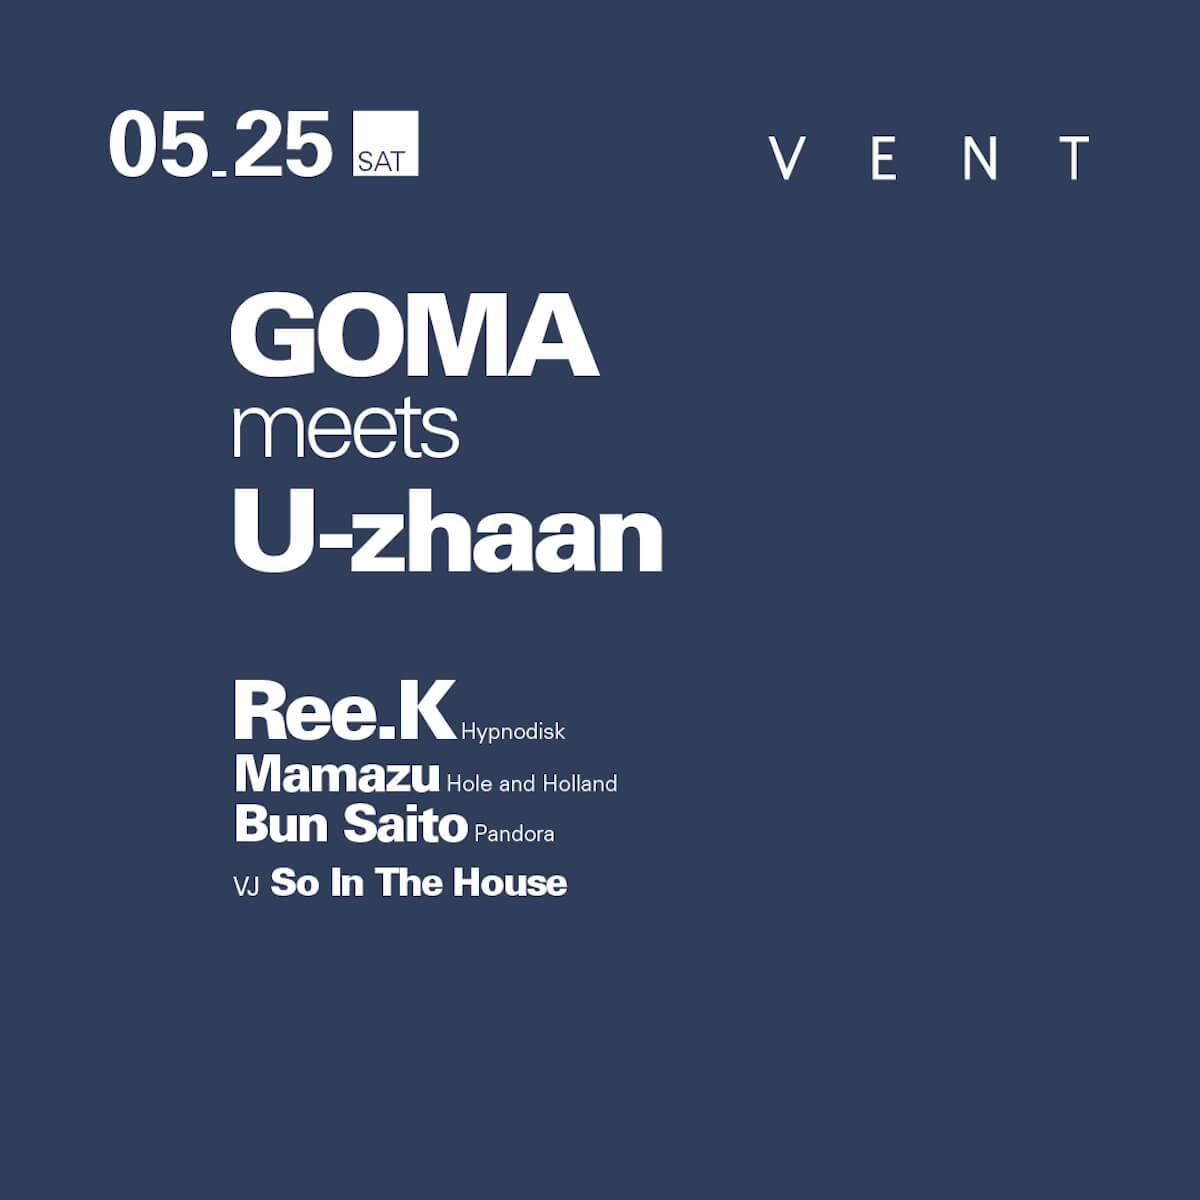 VENTとしては初の試み!GOMA meets U-zhaanがVENTに登場 music190514-goma-meets-u-zhaan-vent-3